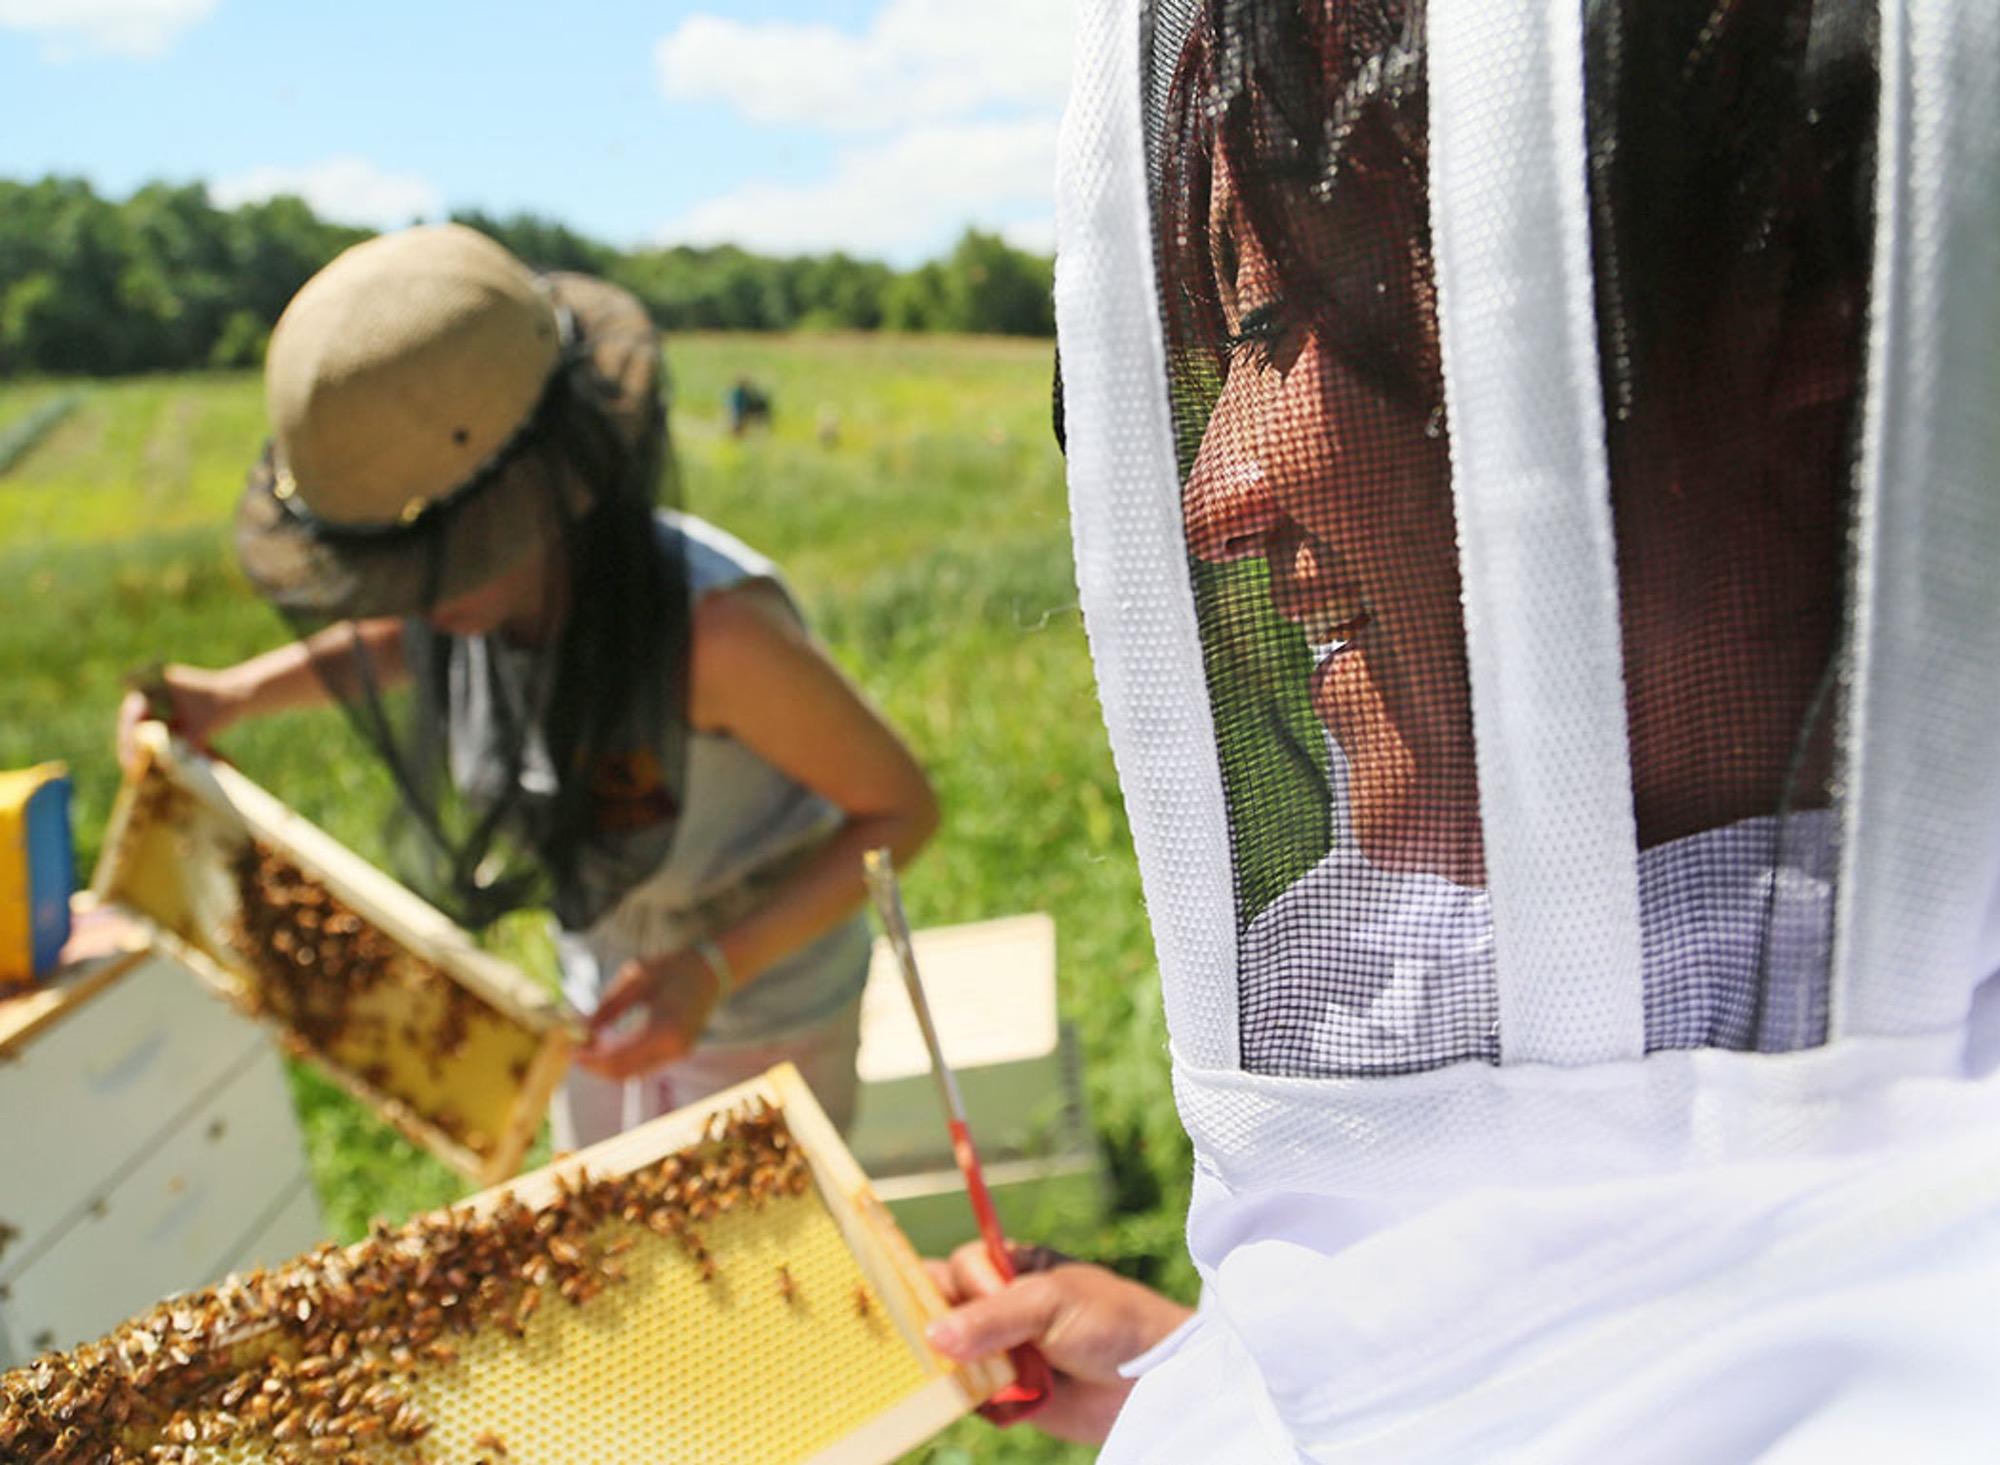 Beekeeping Workshop at Bee Sustainable (Photo Credit to Star Tribune)